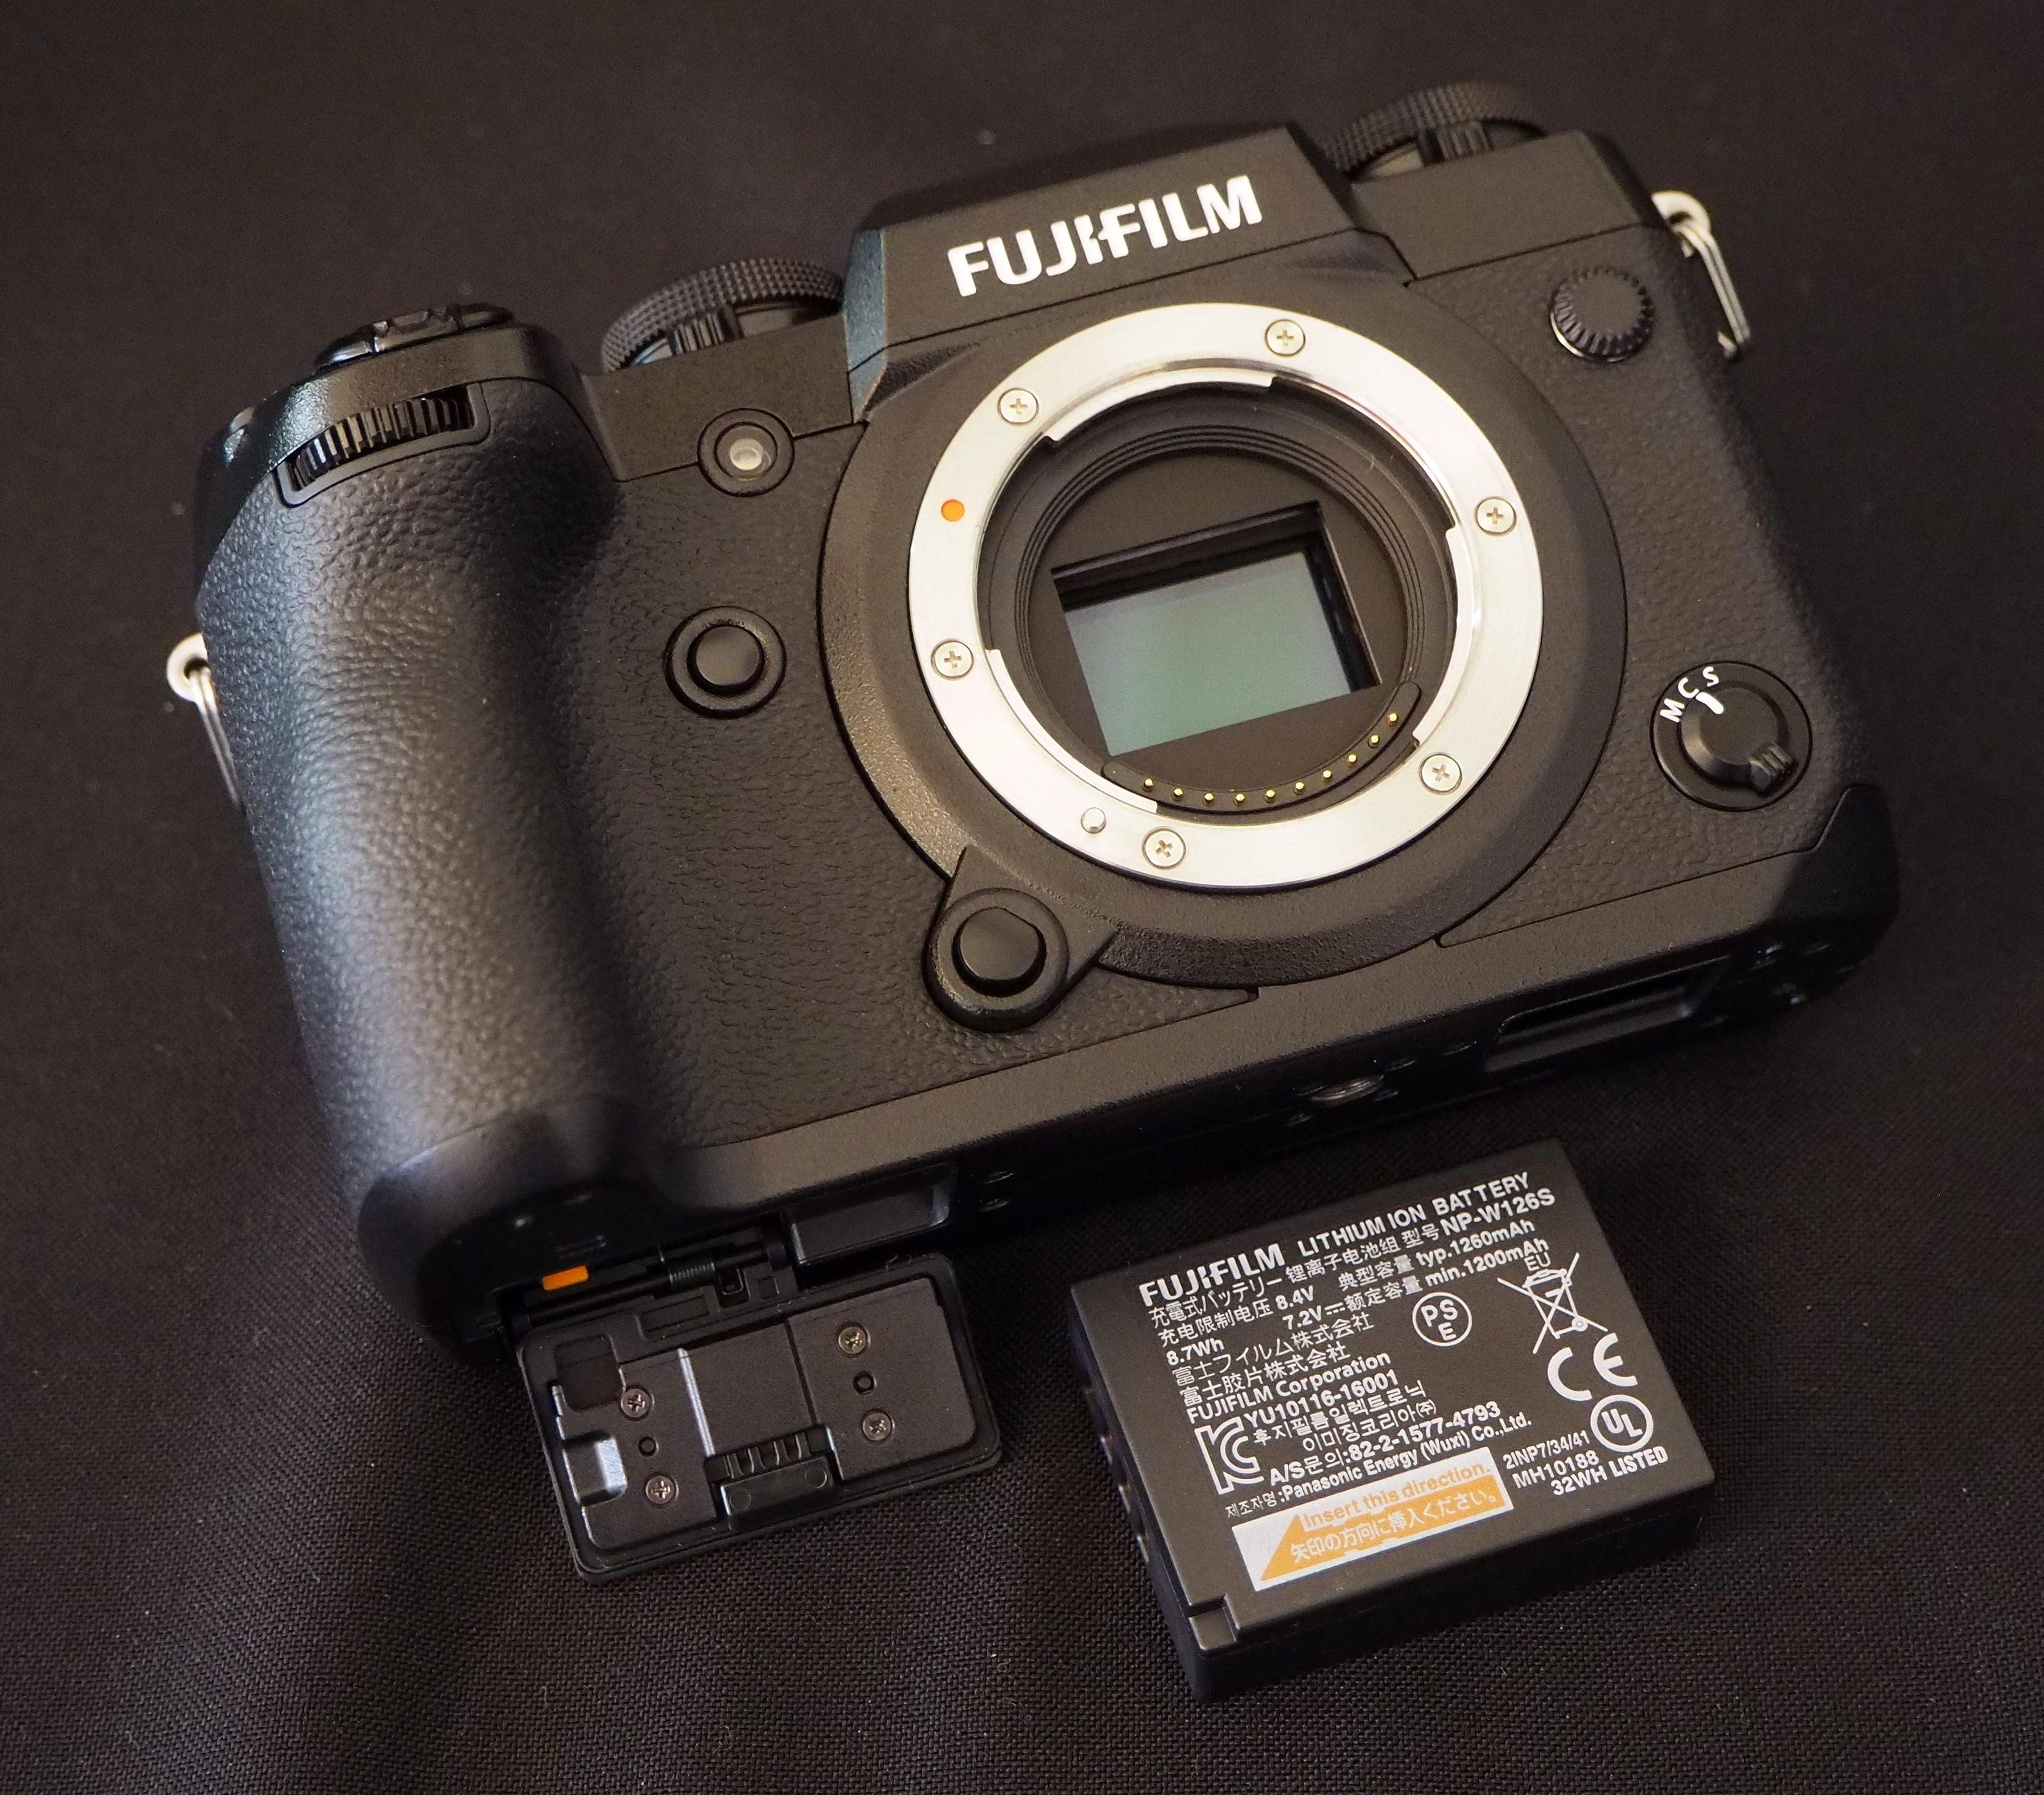 Fujifilm X-H1 Expert Review | ePHOTOzine